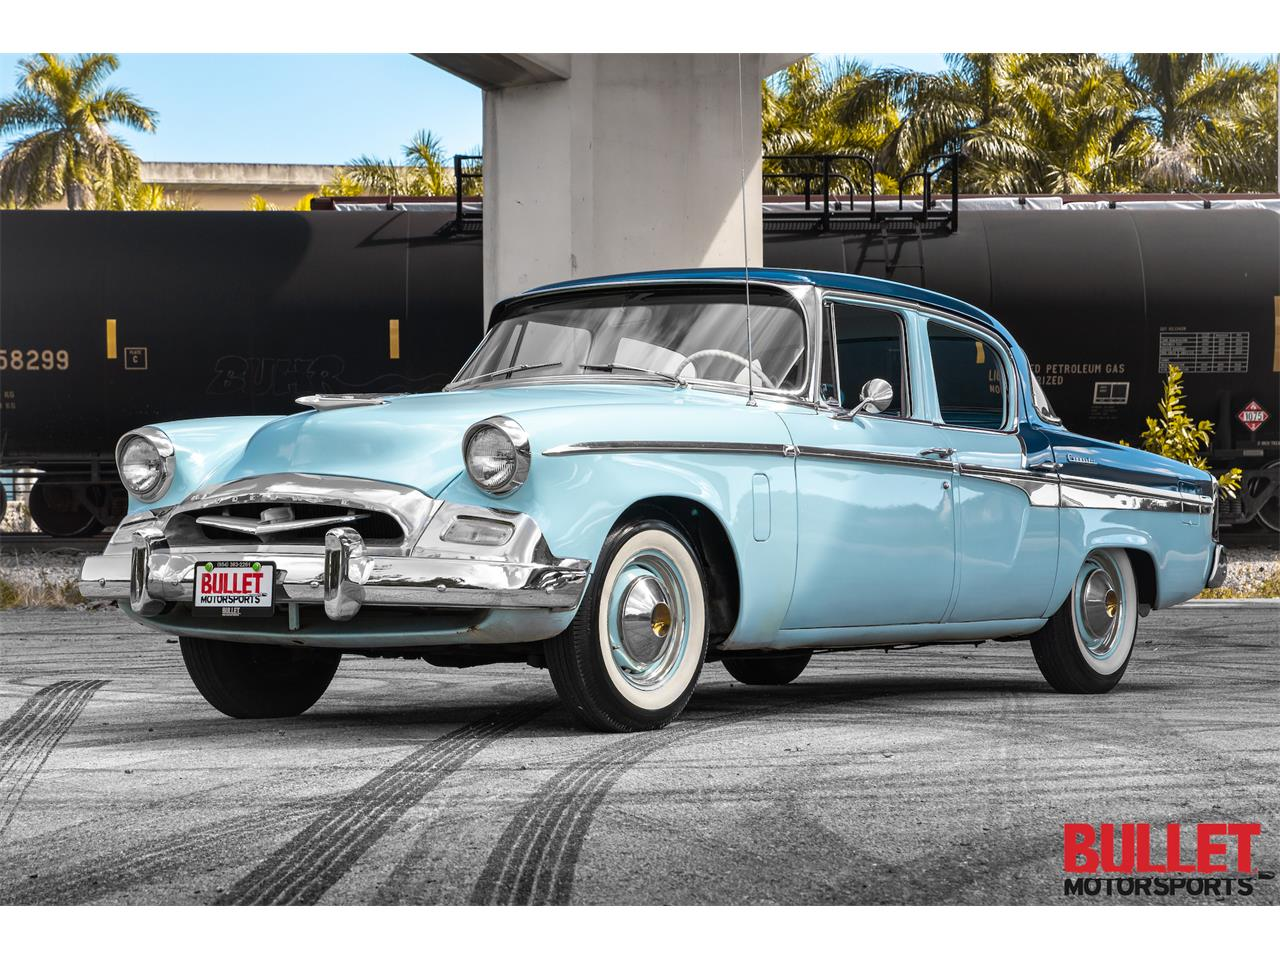 For Sale: 1955 Studebaker Commander in Fort Lauderdale, Florida